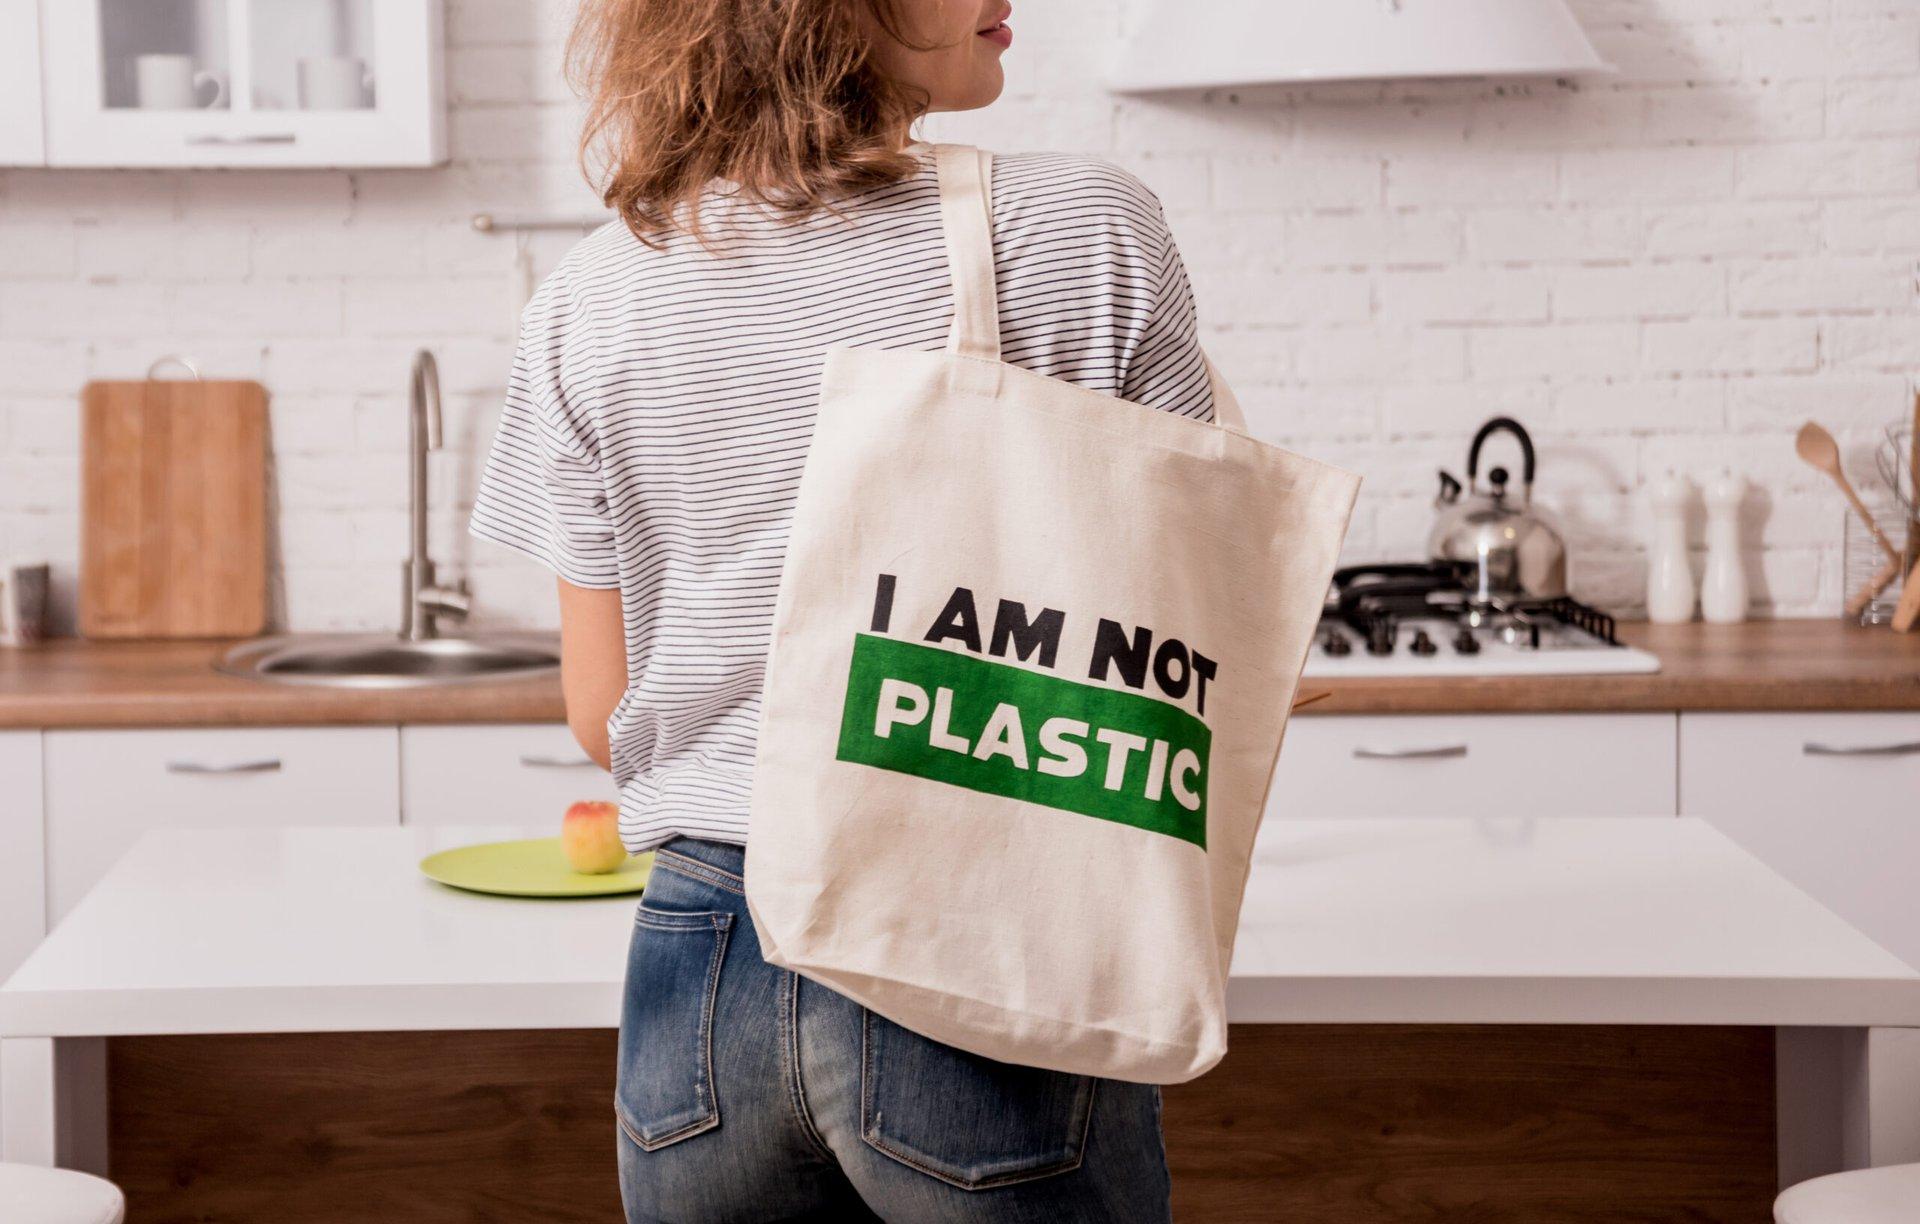 Woman carrying a reusable shopping bag